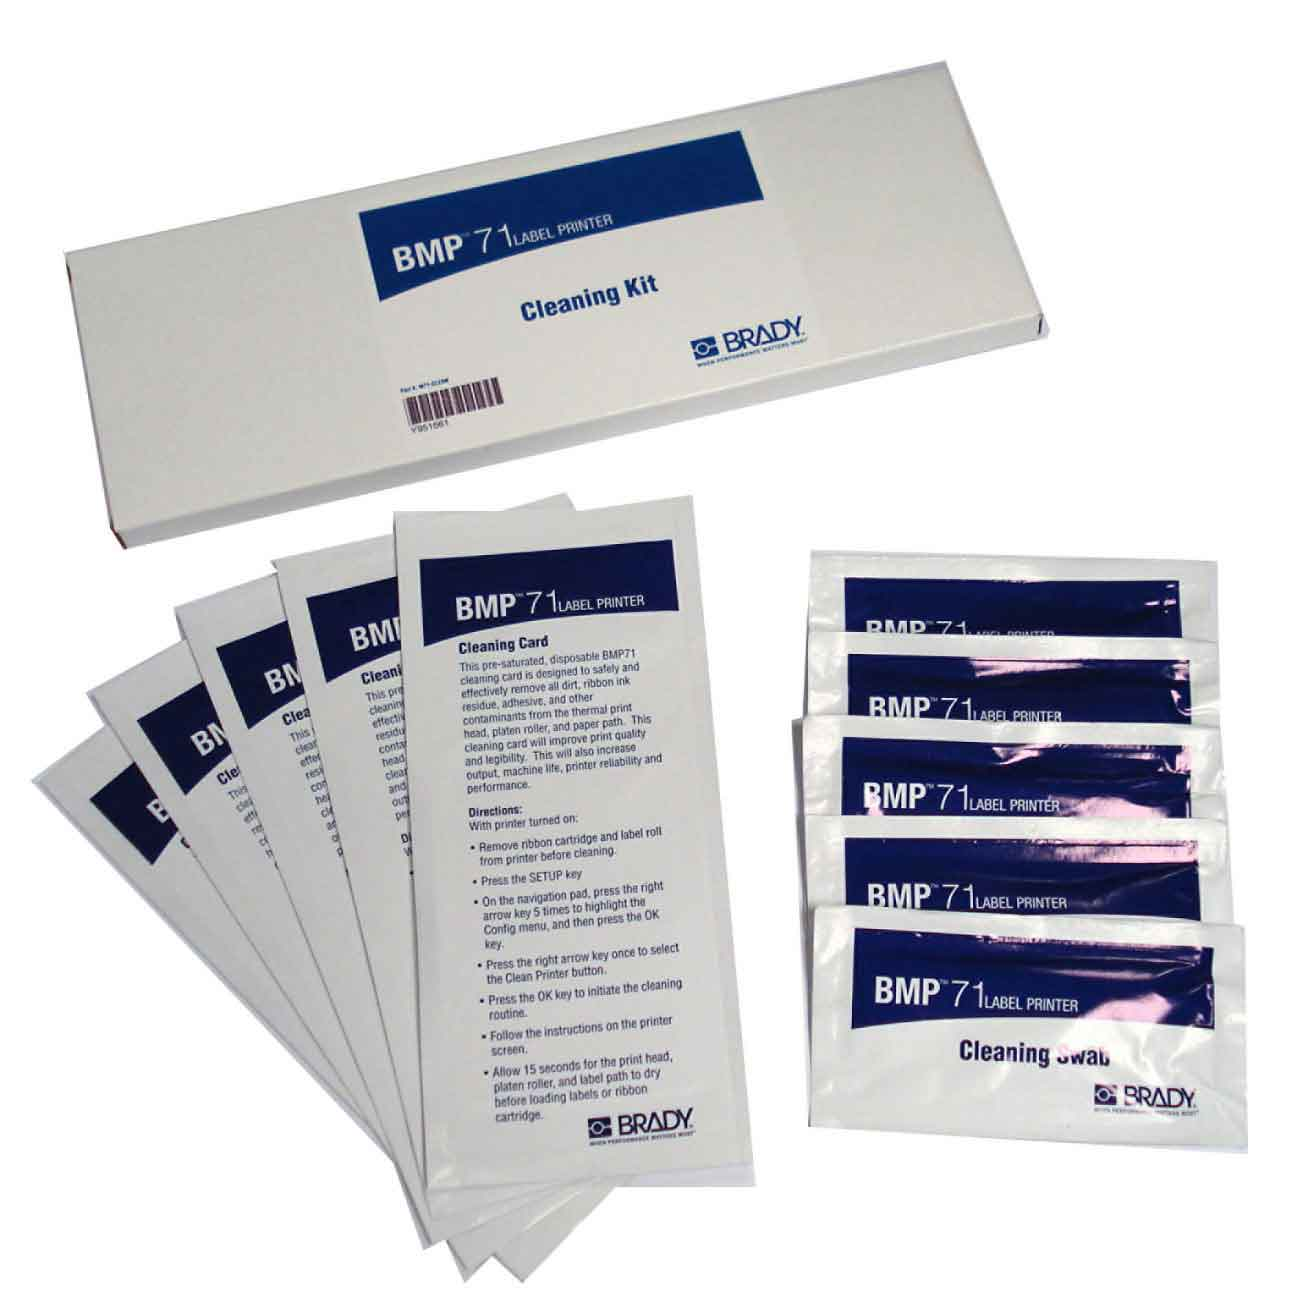 BRADY M71-CLEAN Cleaning Kit